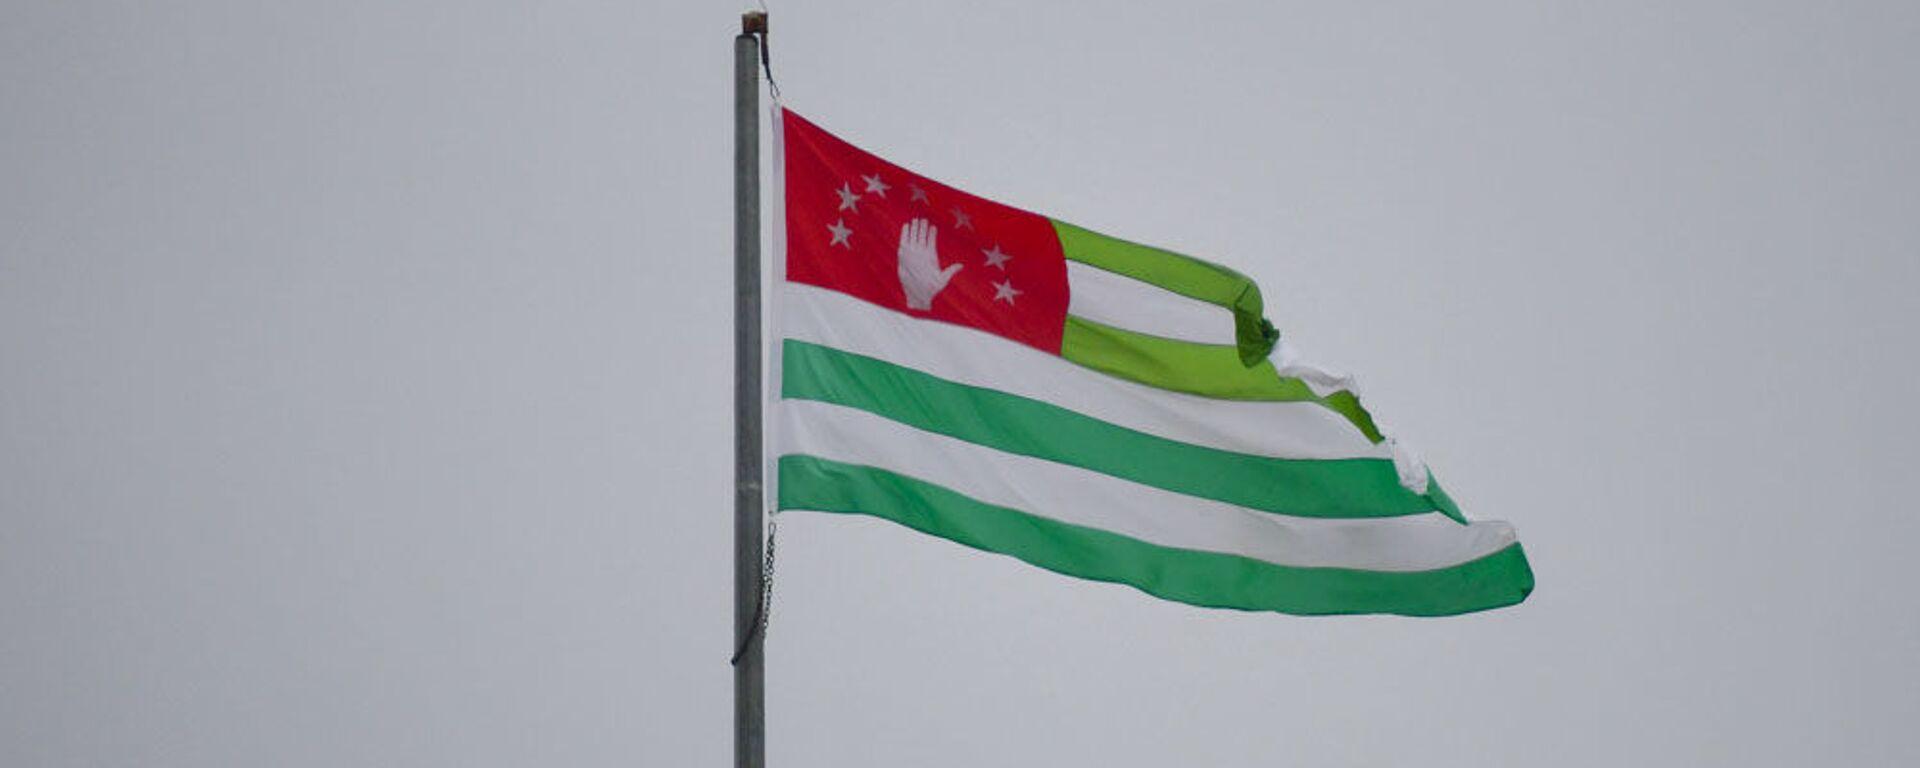 Флаг Абхазии - Sputnik Абхазия, 1920, 13.10.2021